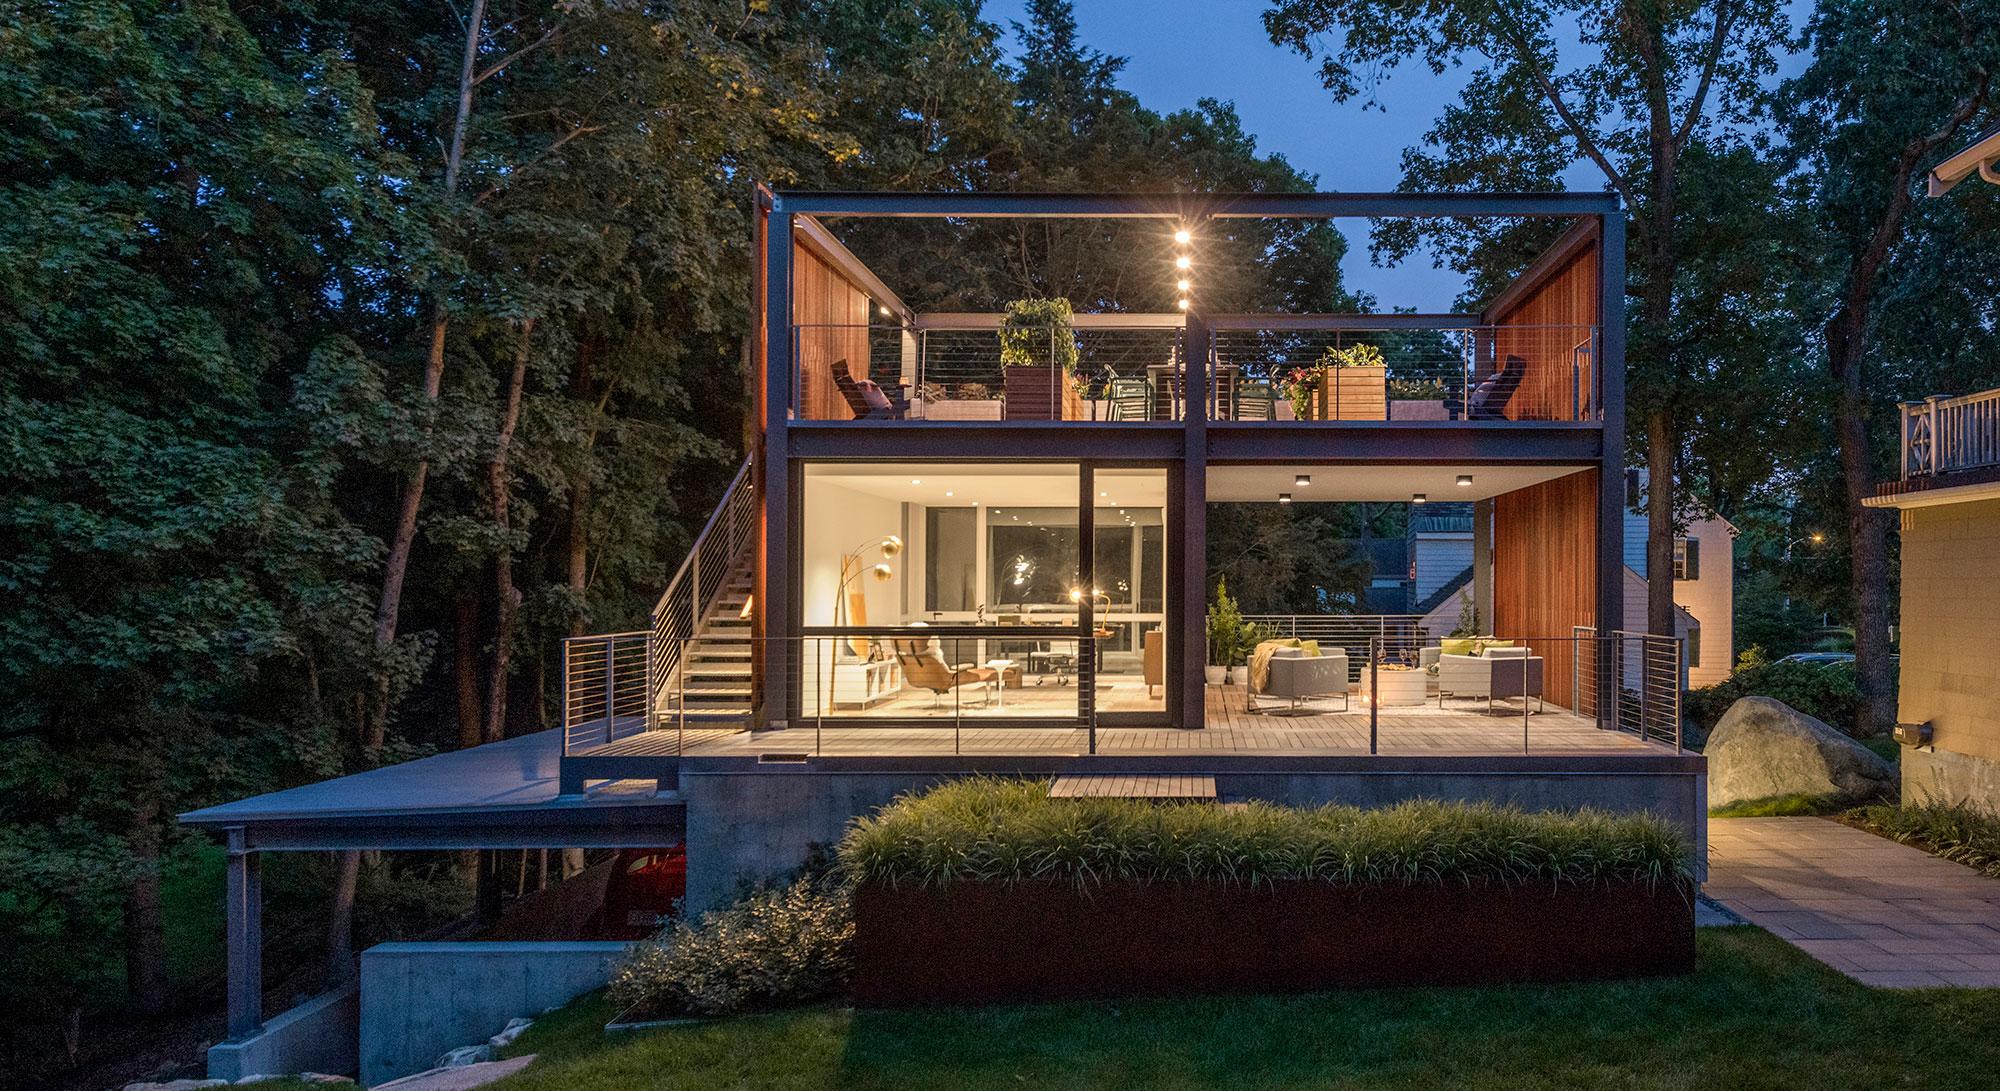 3-story backyard home office studio rooftop open-air veranda glowing at dusk